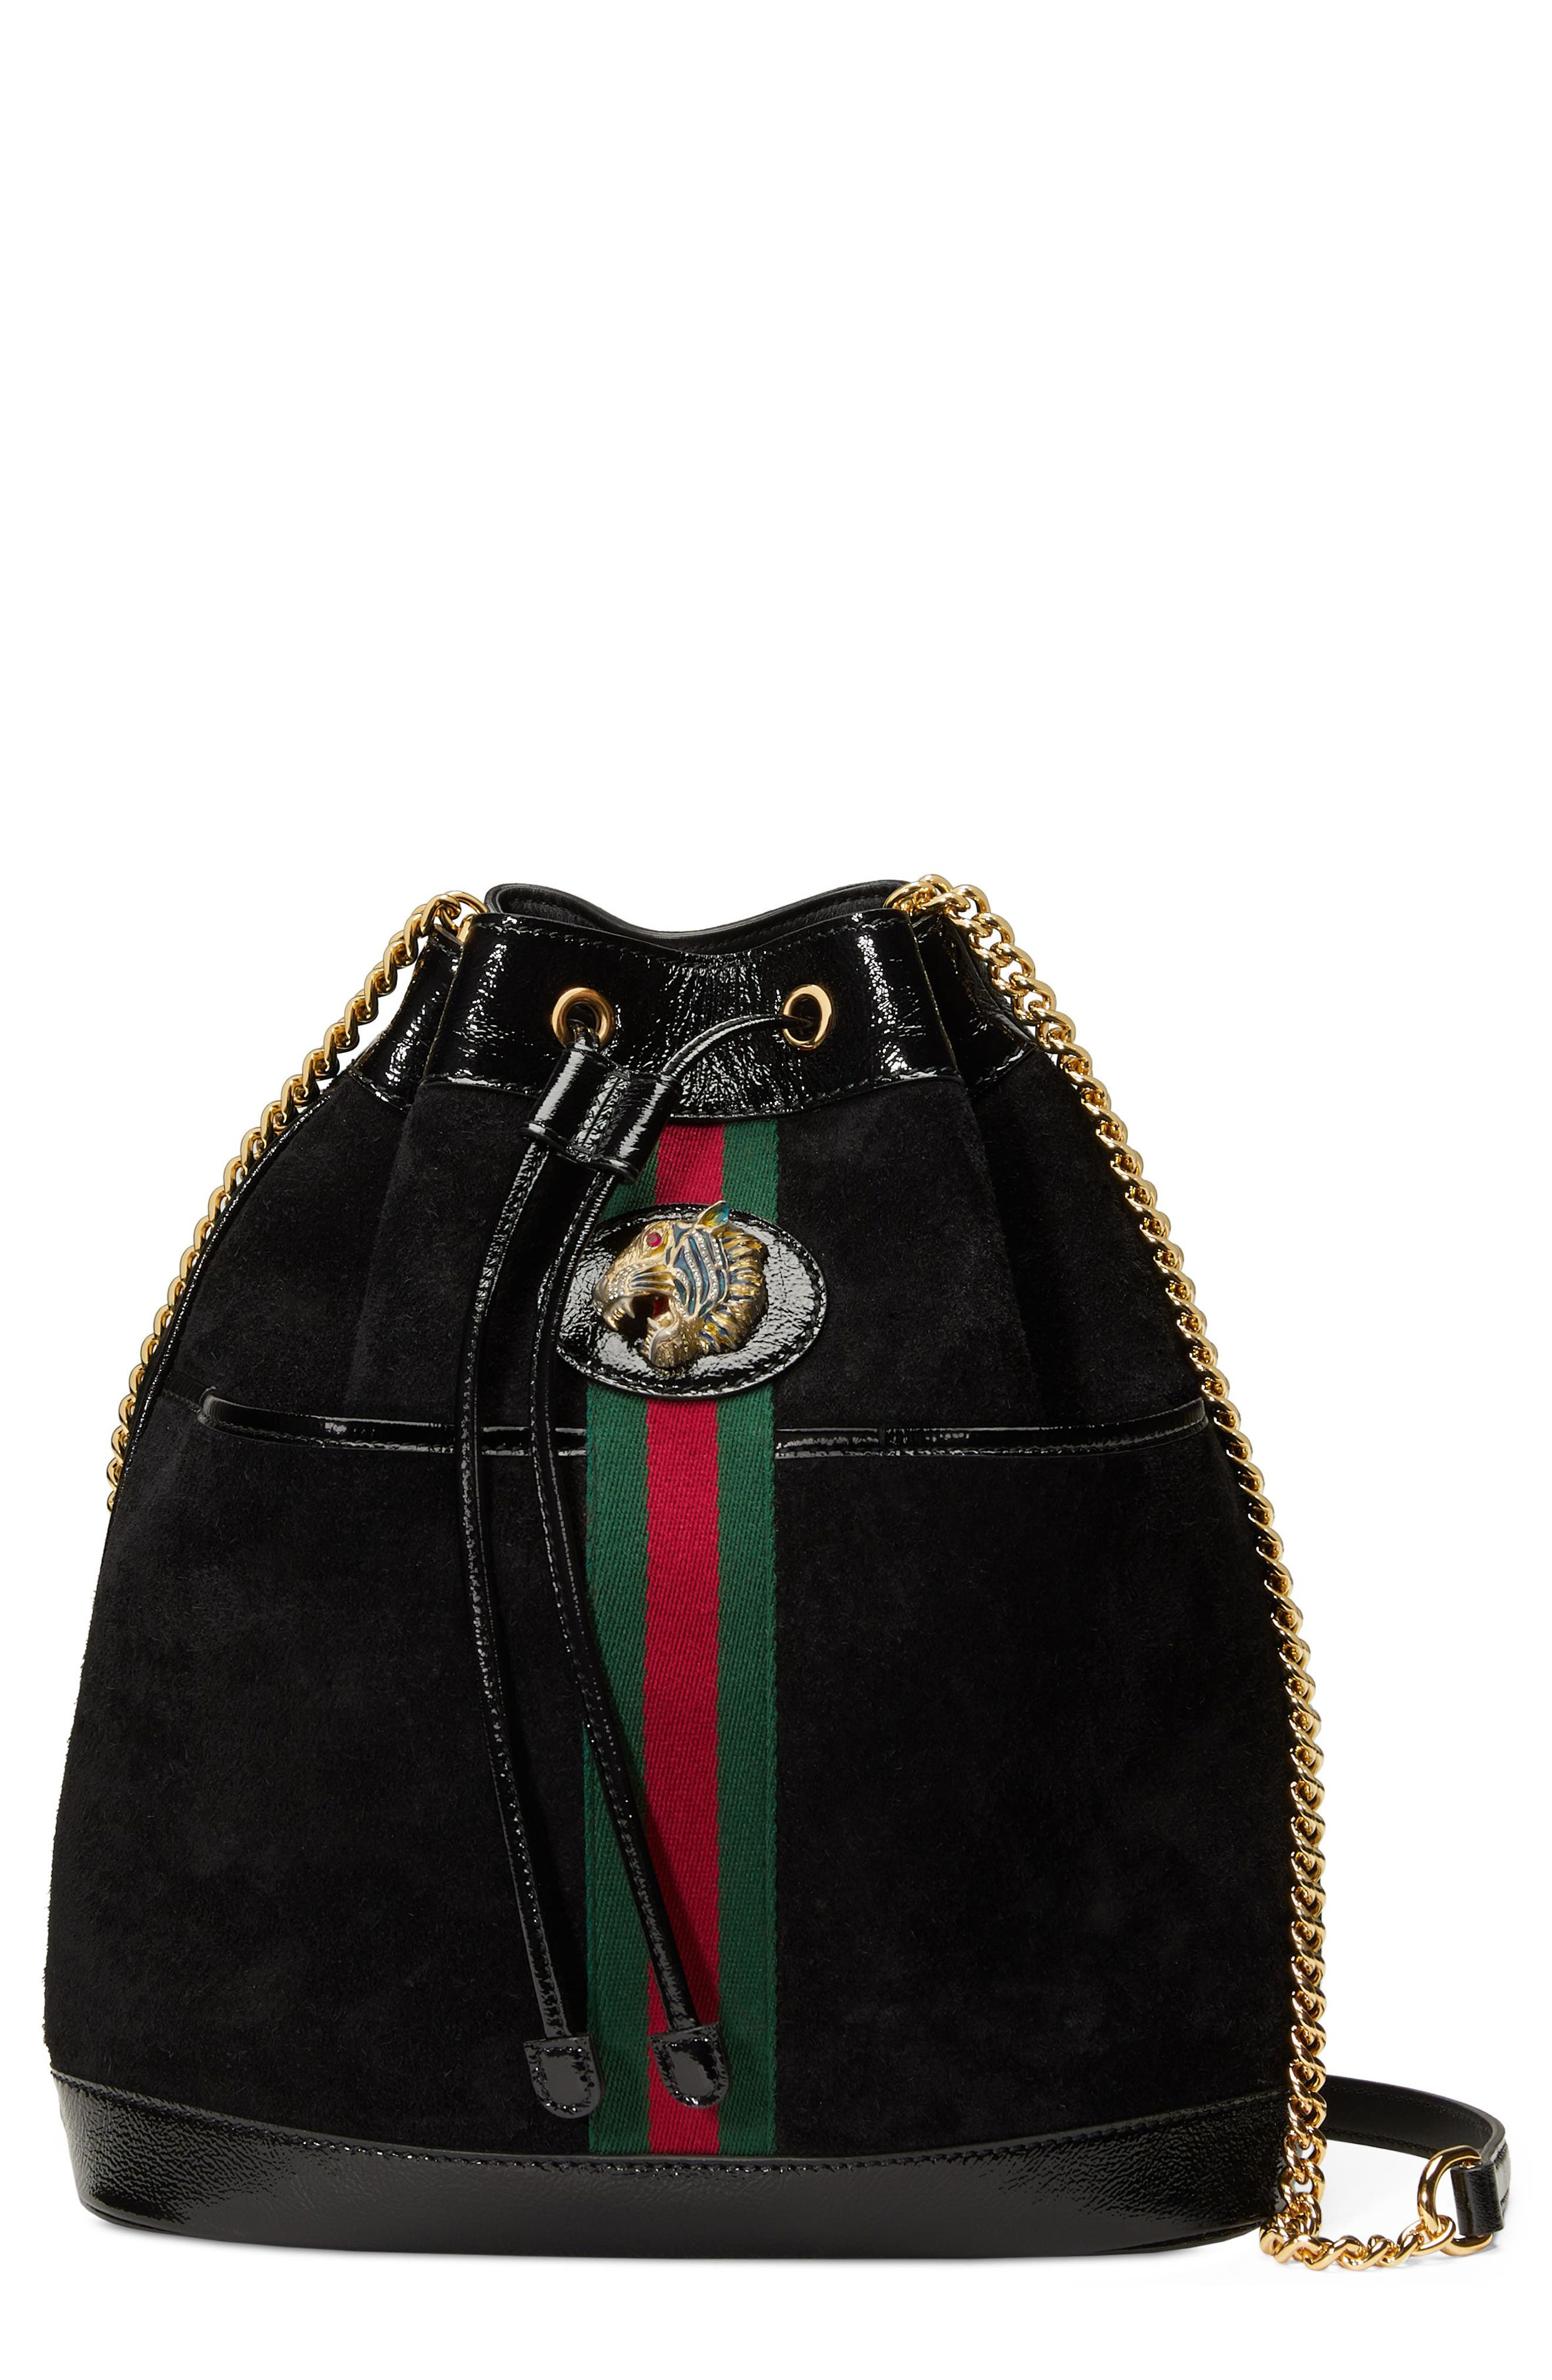 Linea Rajah Suede Bucket Bag,                         Main,                         color, NERO/ VERT/ RED MULTI